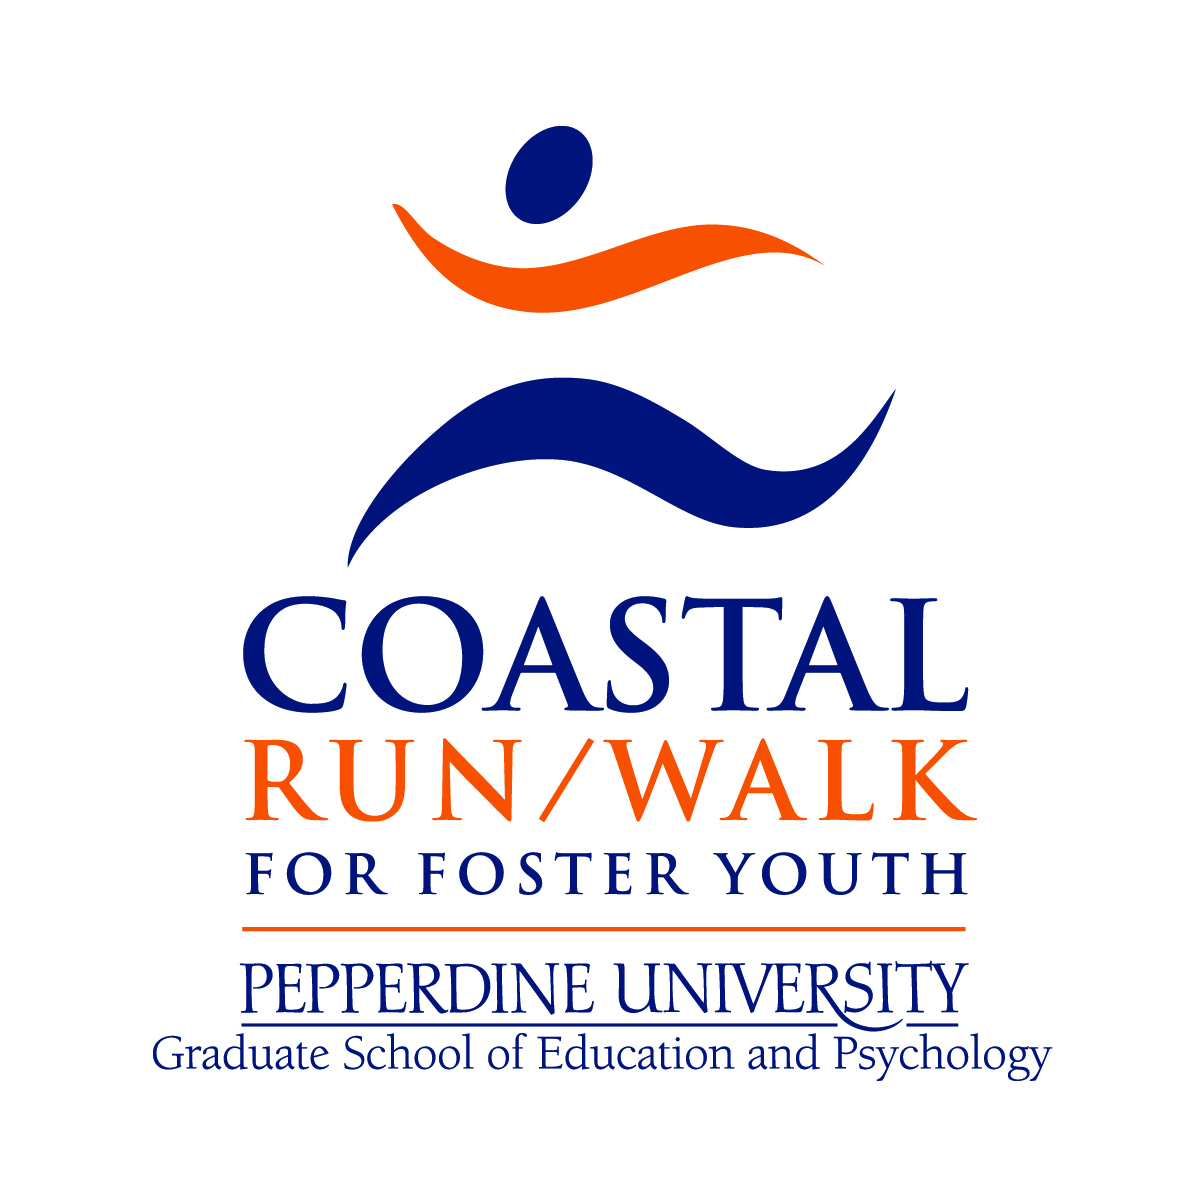 COASTAL RUN WALK WITH ORIGINAL LOGO FINAL 281C 158C (2)_1